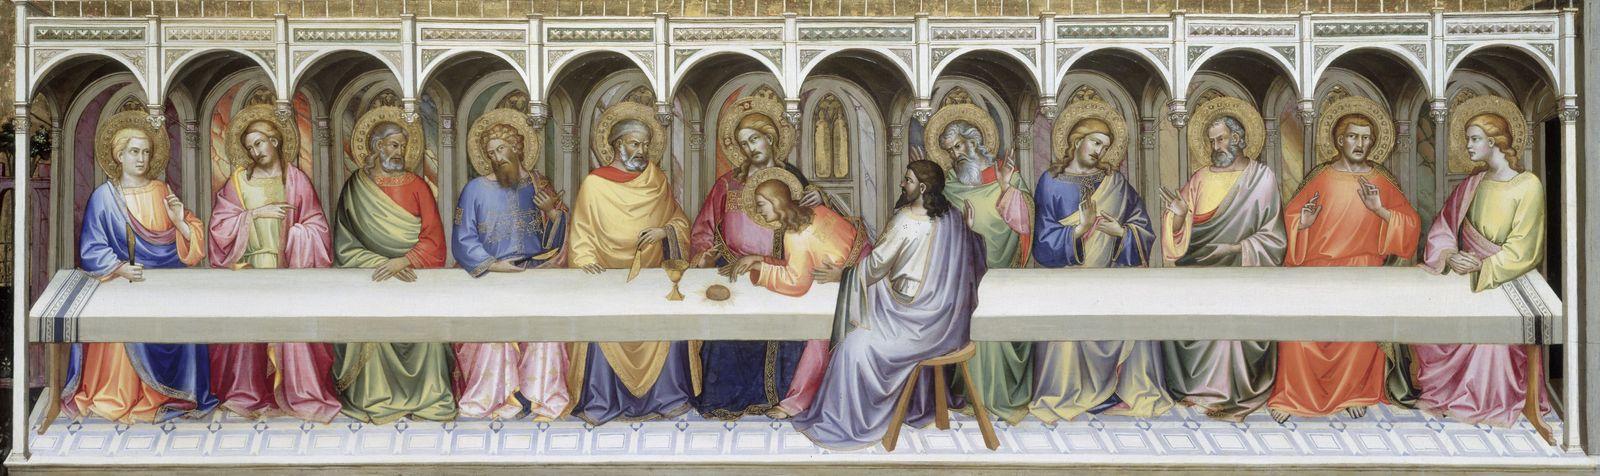 Lorenzo Monaco: Das Abendmahl, 1389/90 © bpk / Gemäldegalerie, SMB / Jörg P. Anders